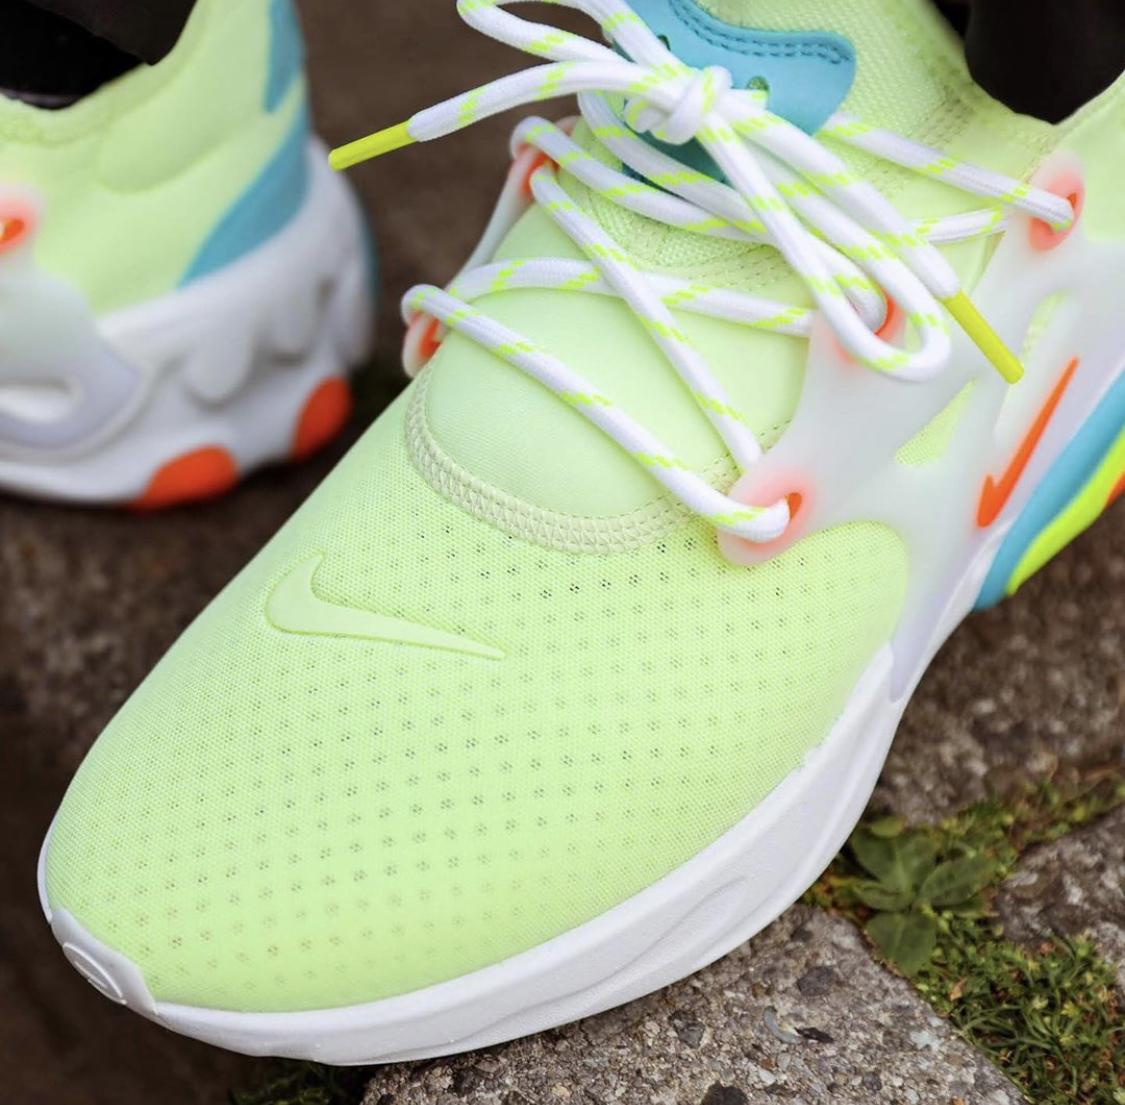 976ed695d03 Shop The Nike React Presto Psychedelic Lava Early Here • KicksOnFire.com